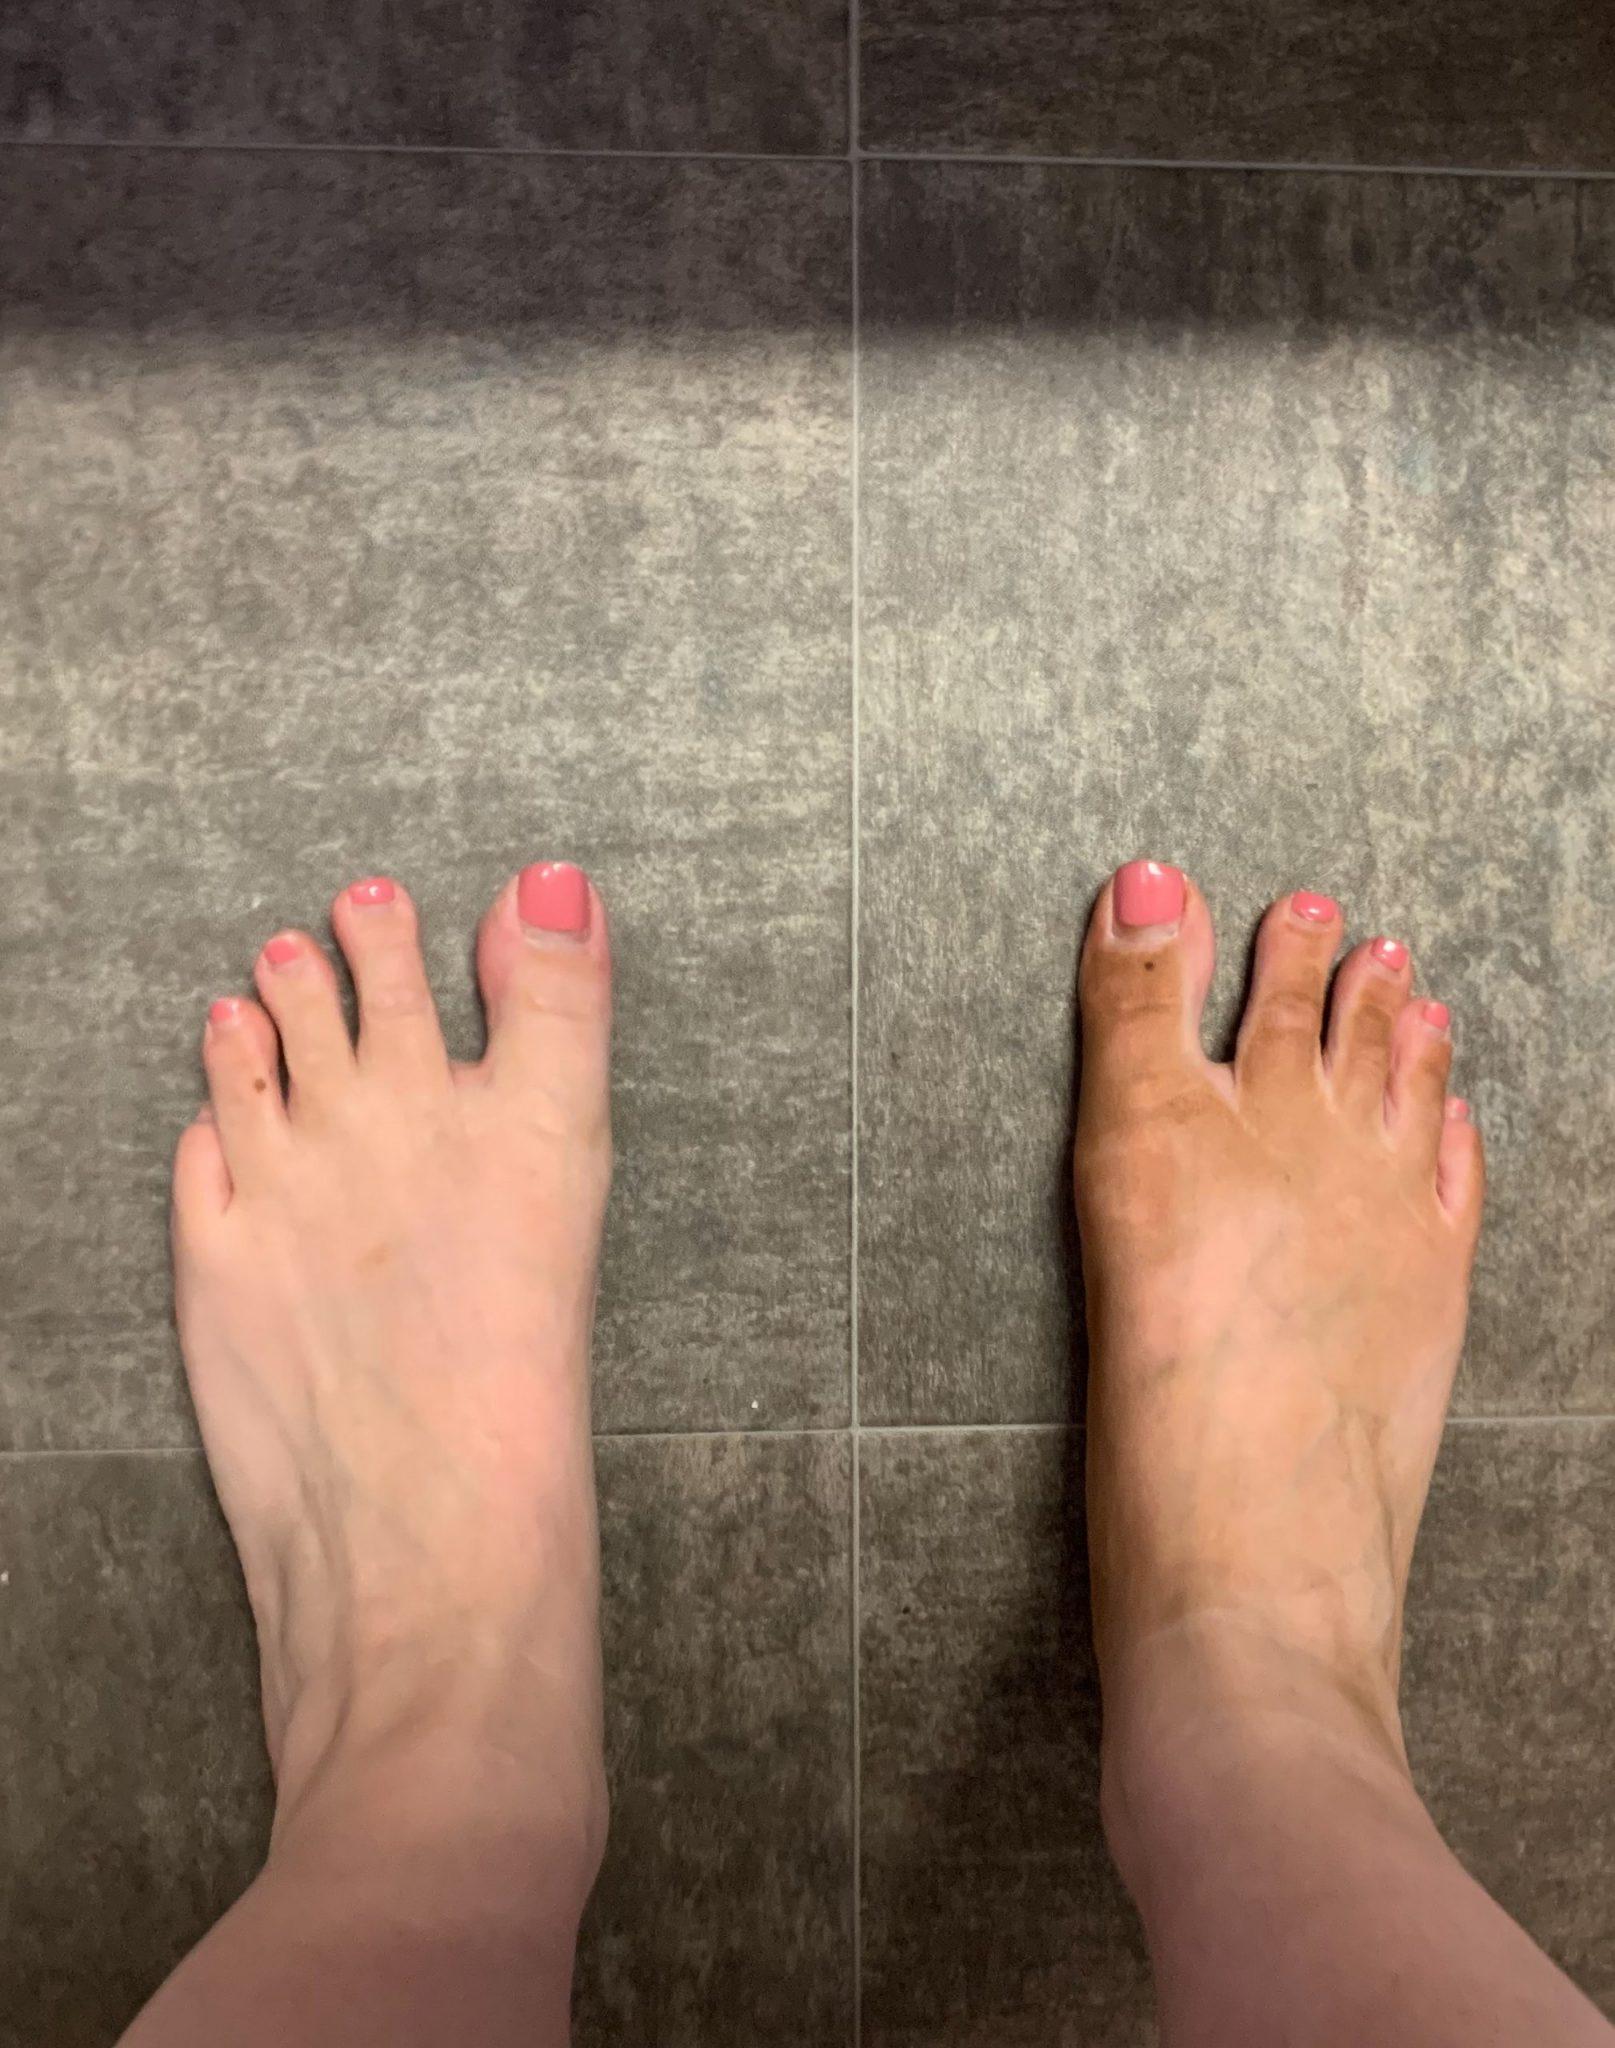 Bali Body Self Tan Remover Review ⋆ Beautymone